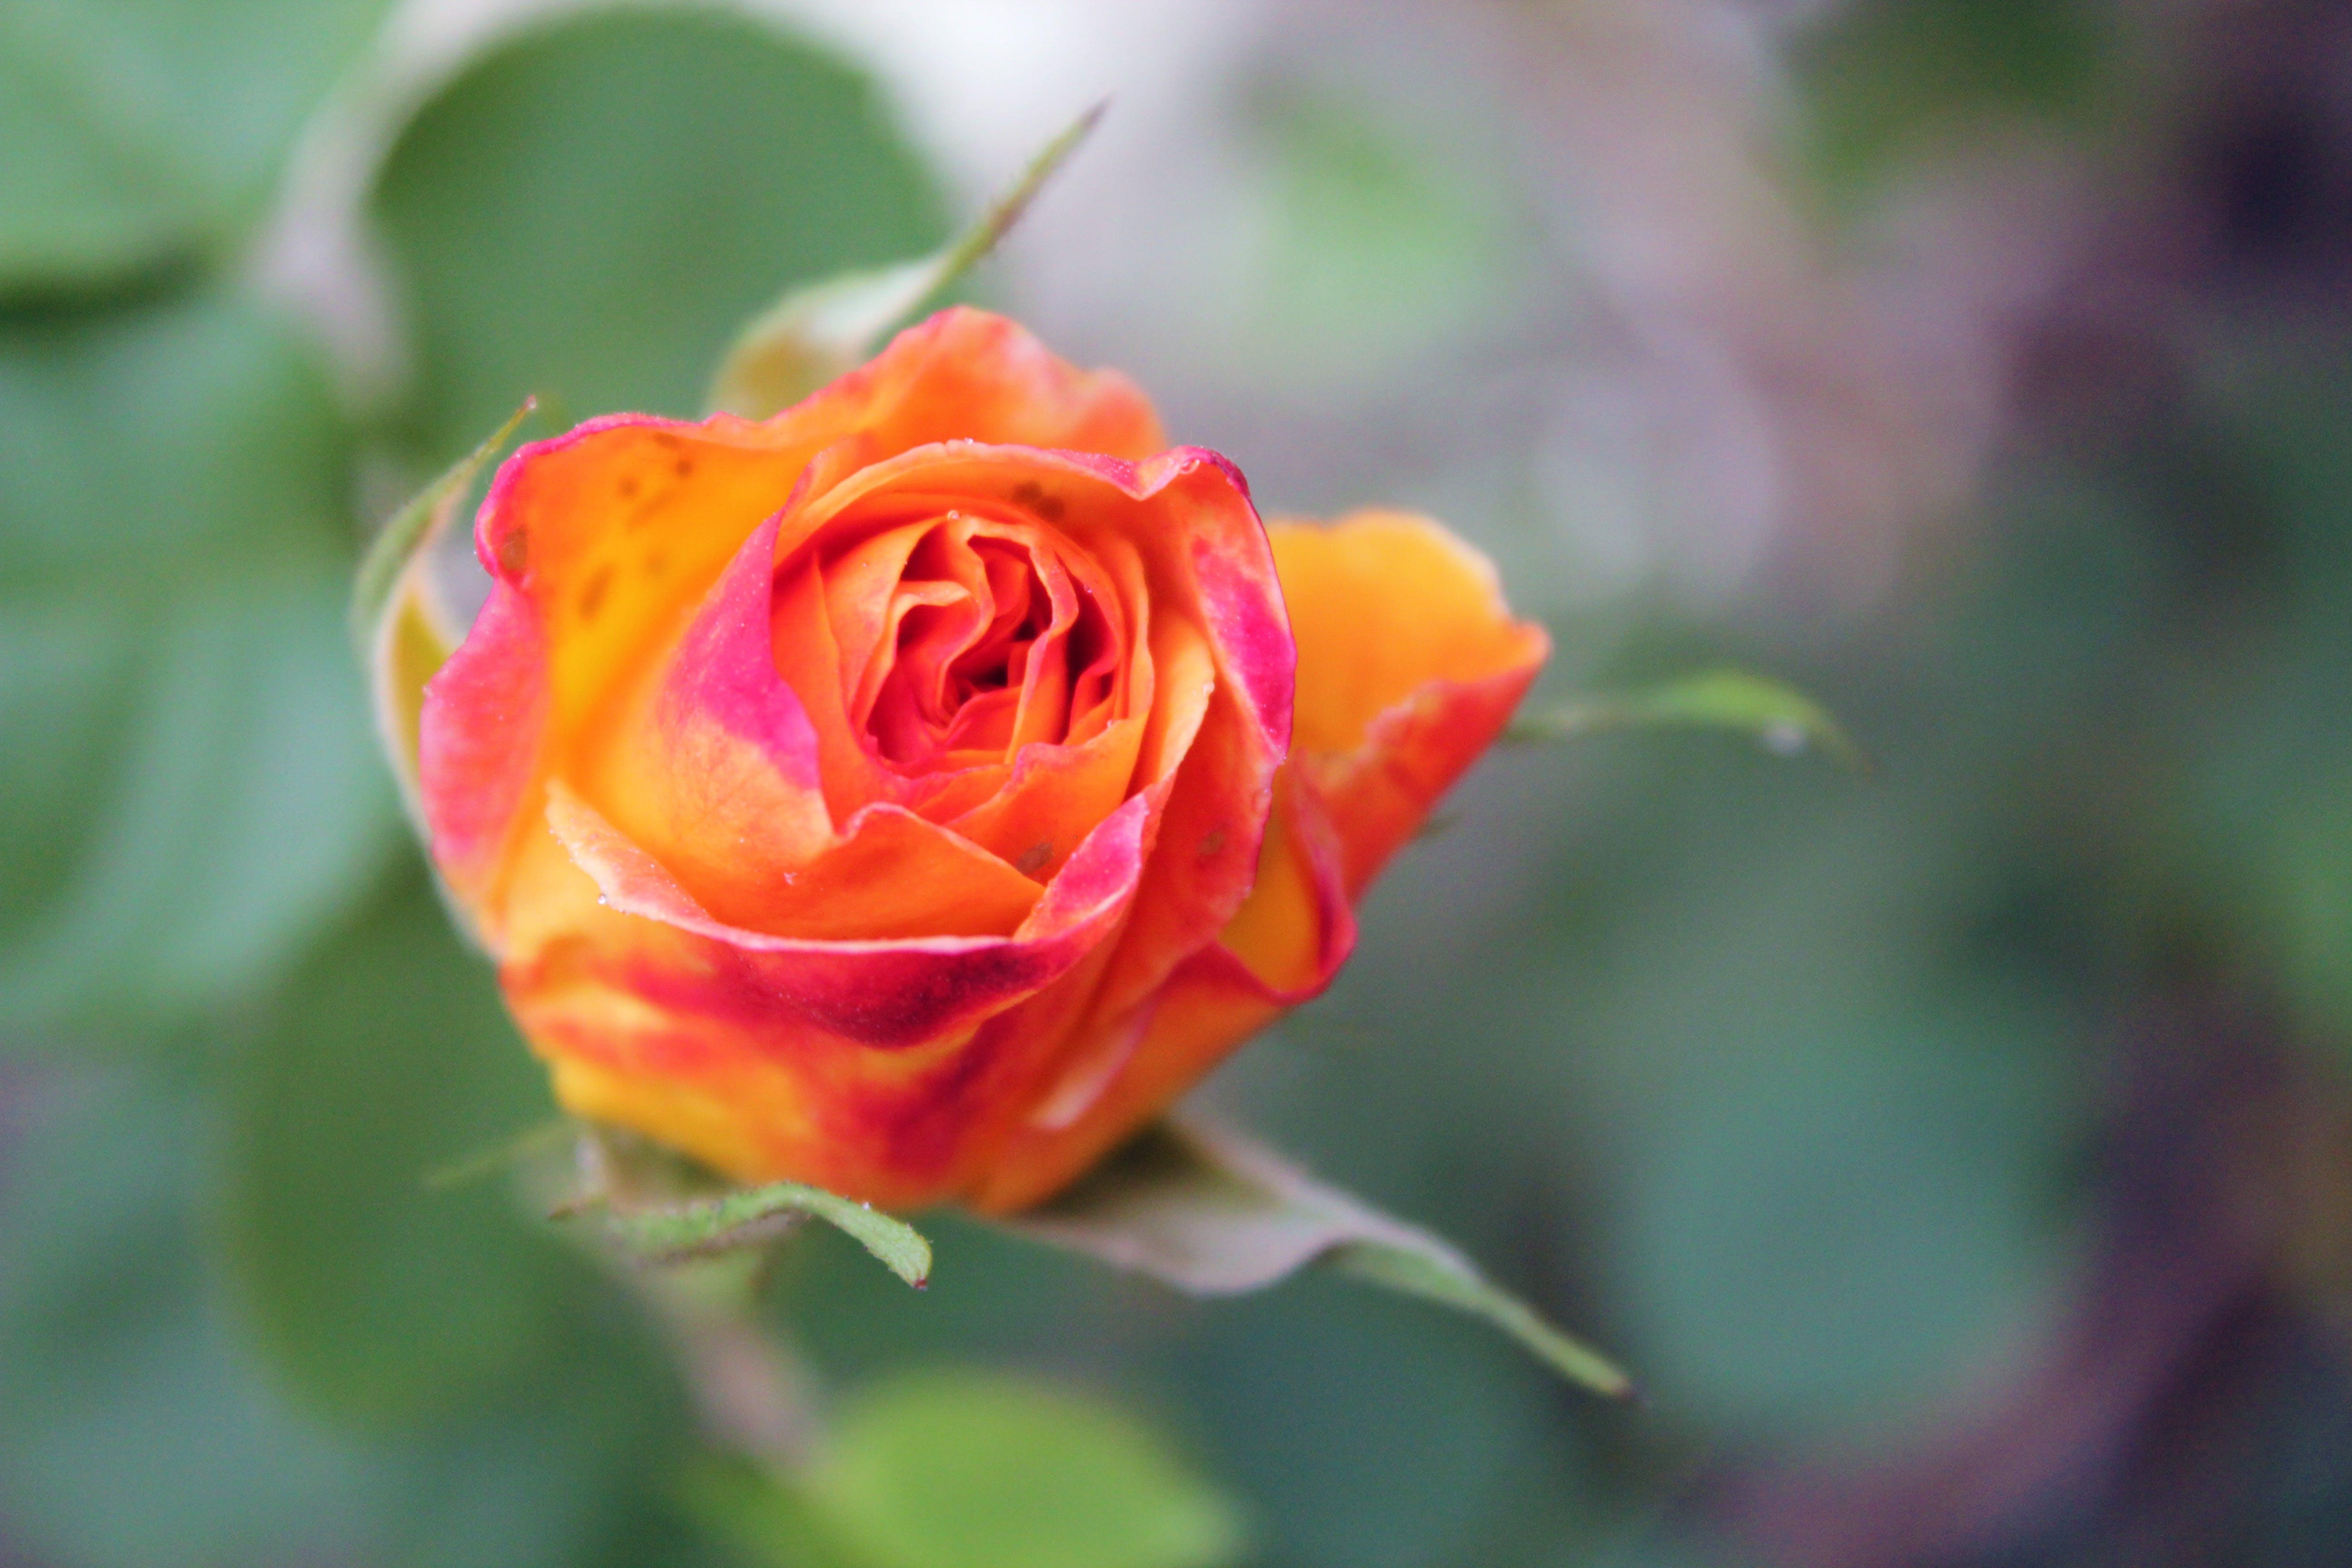 Free stock photo of Orange Rose